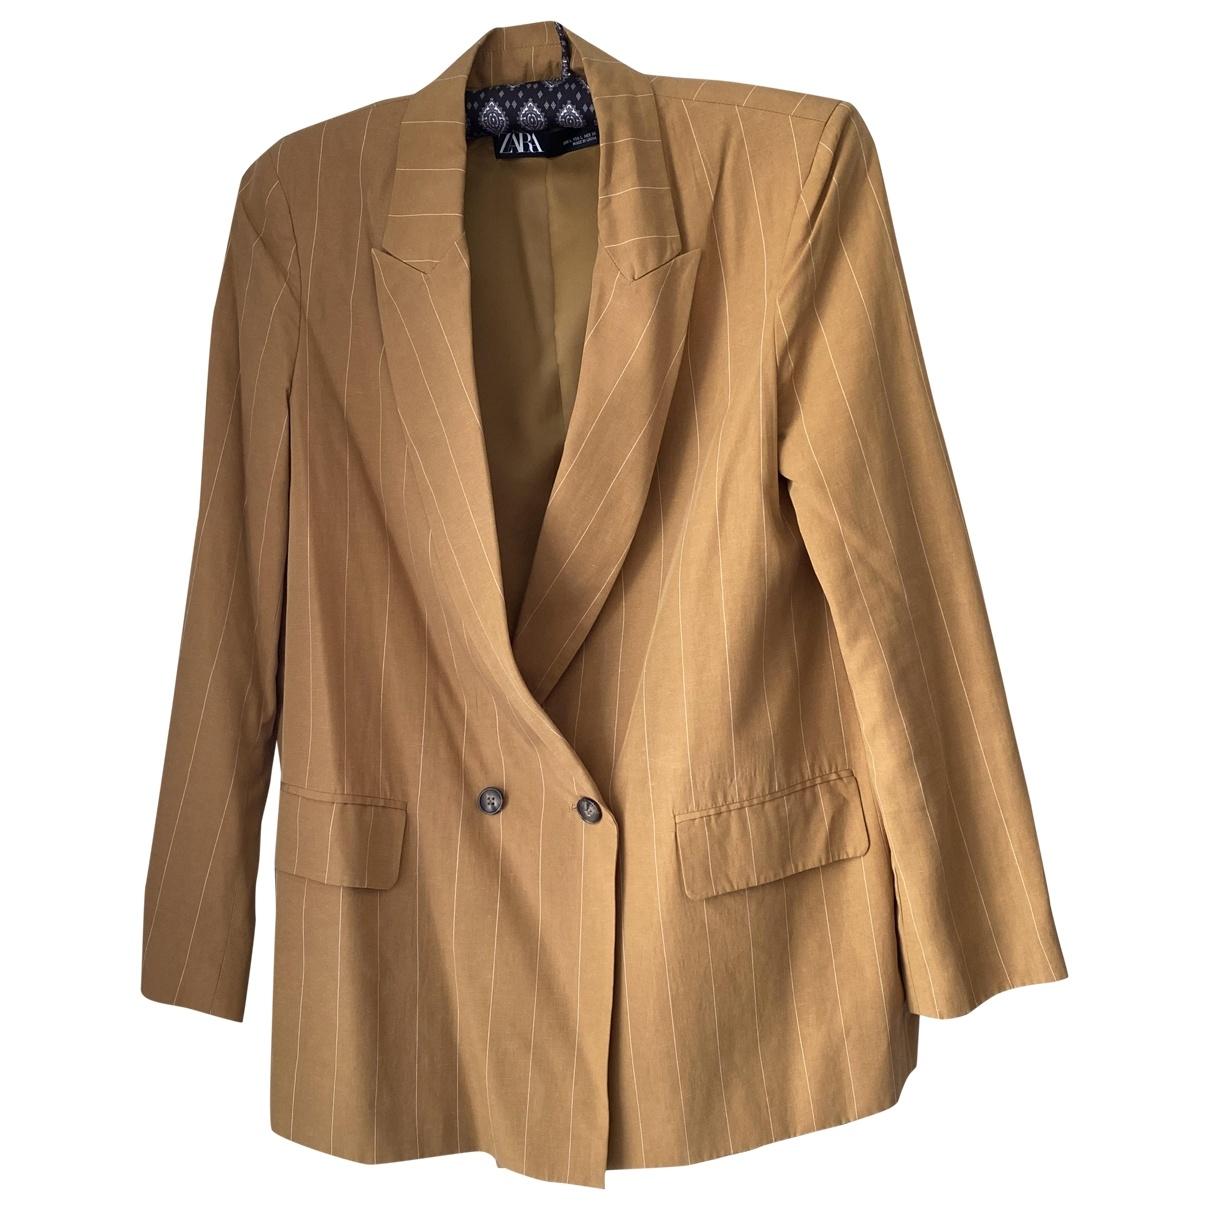 Zara \N Yellow Linen jacket for Women L International